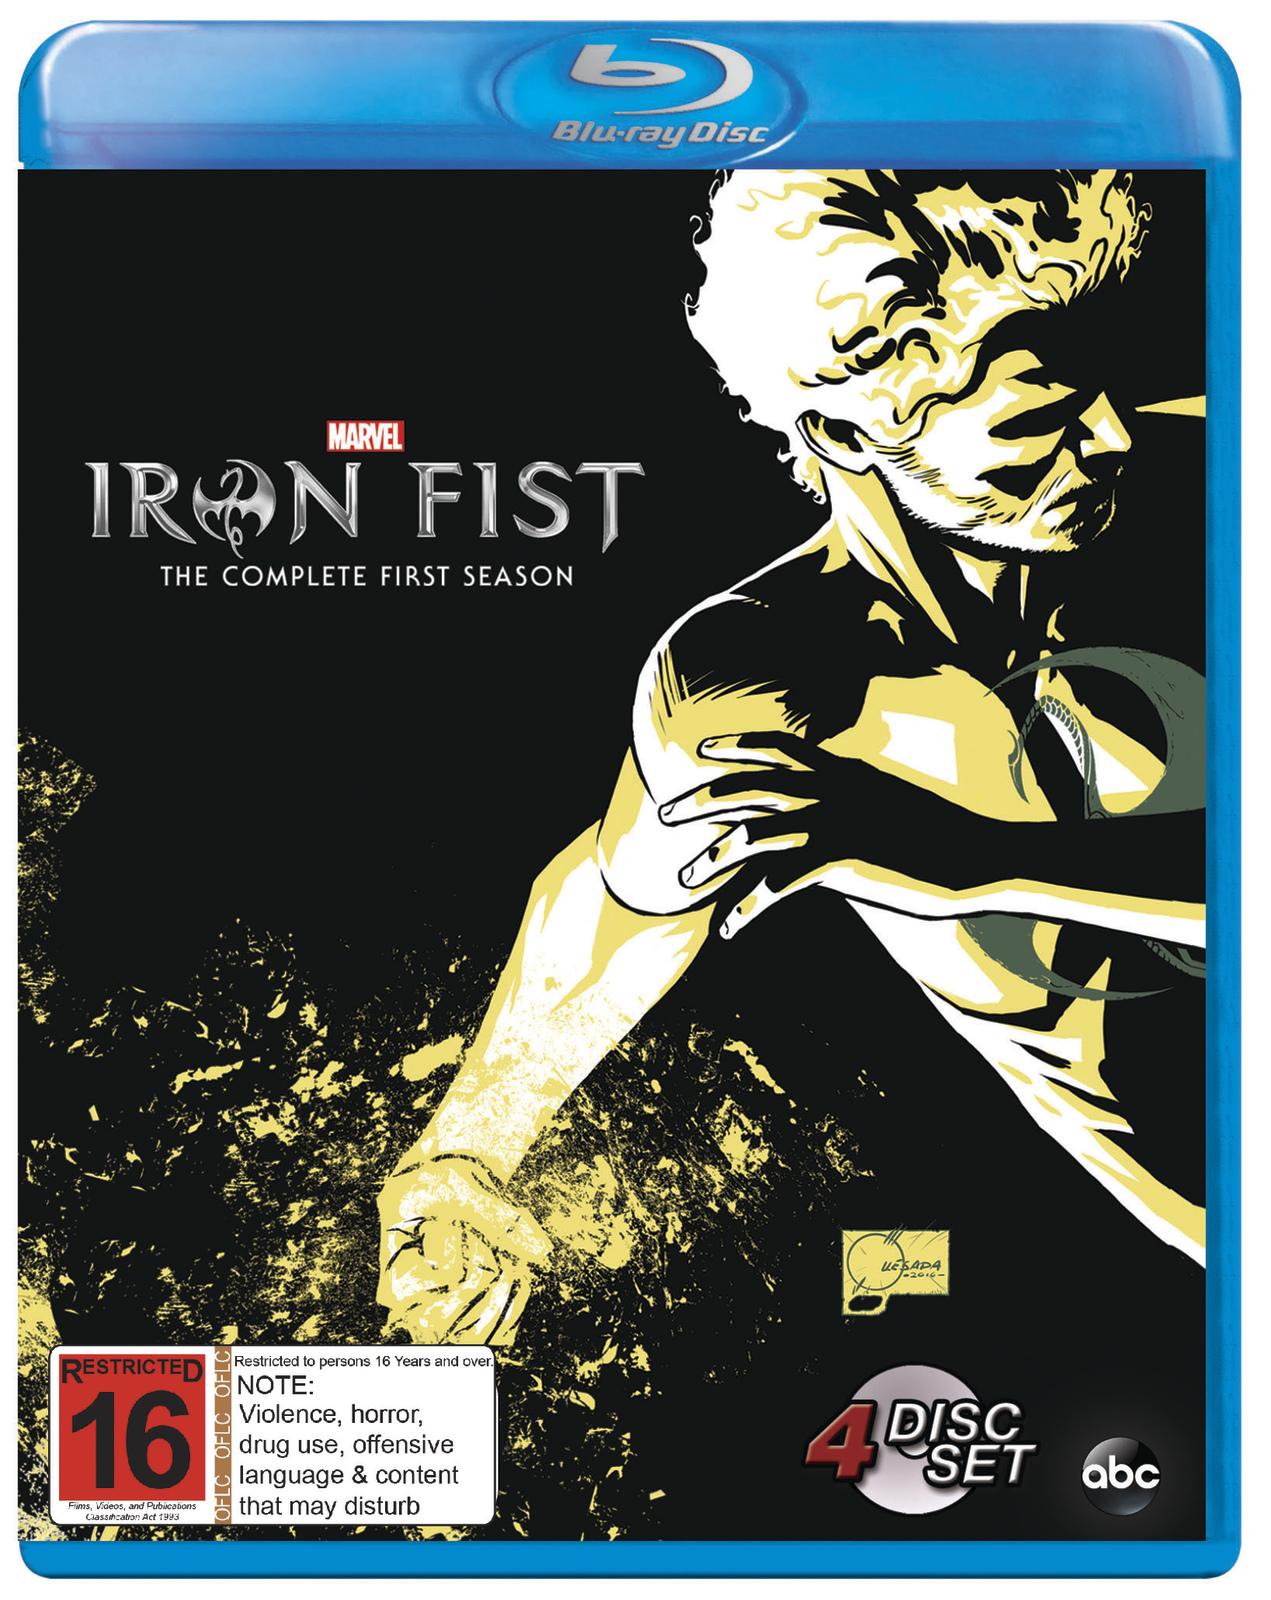 Iron Fist on Blu-ray image